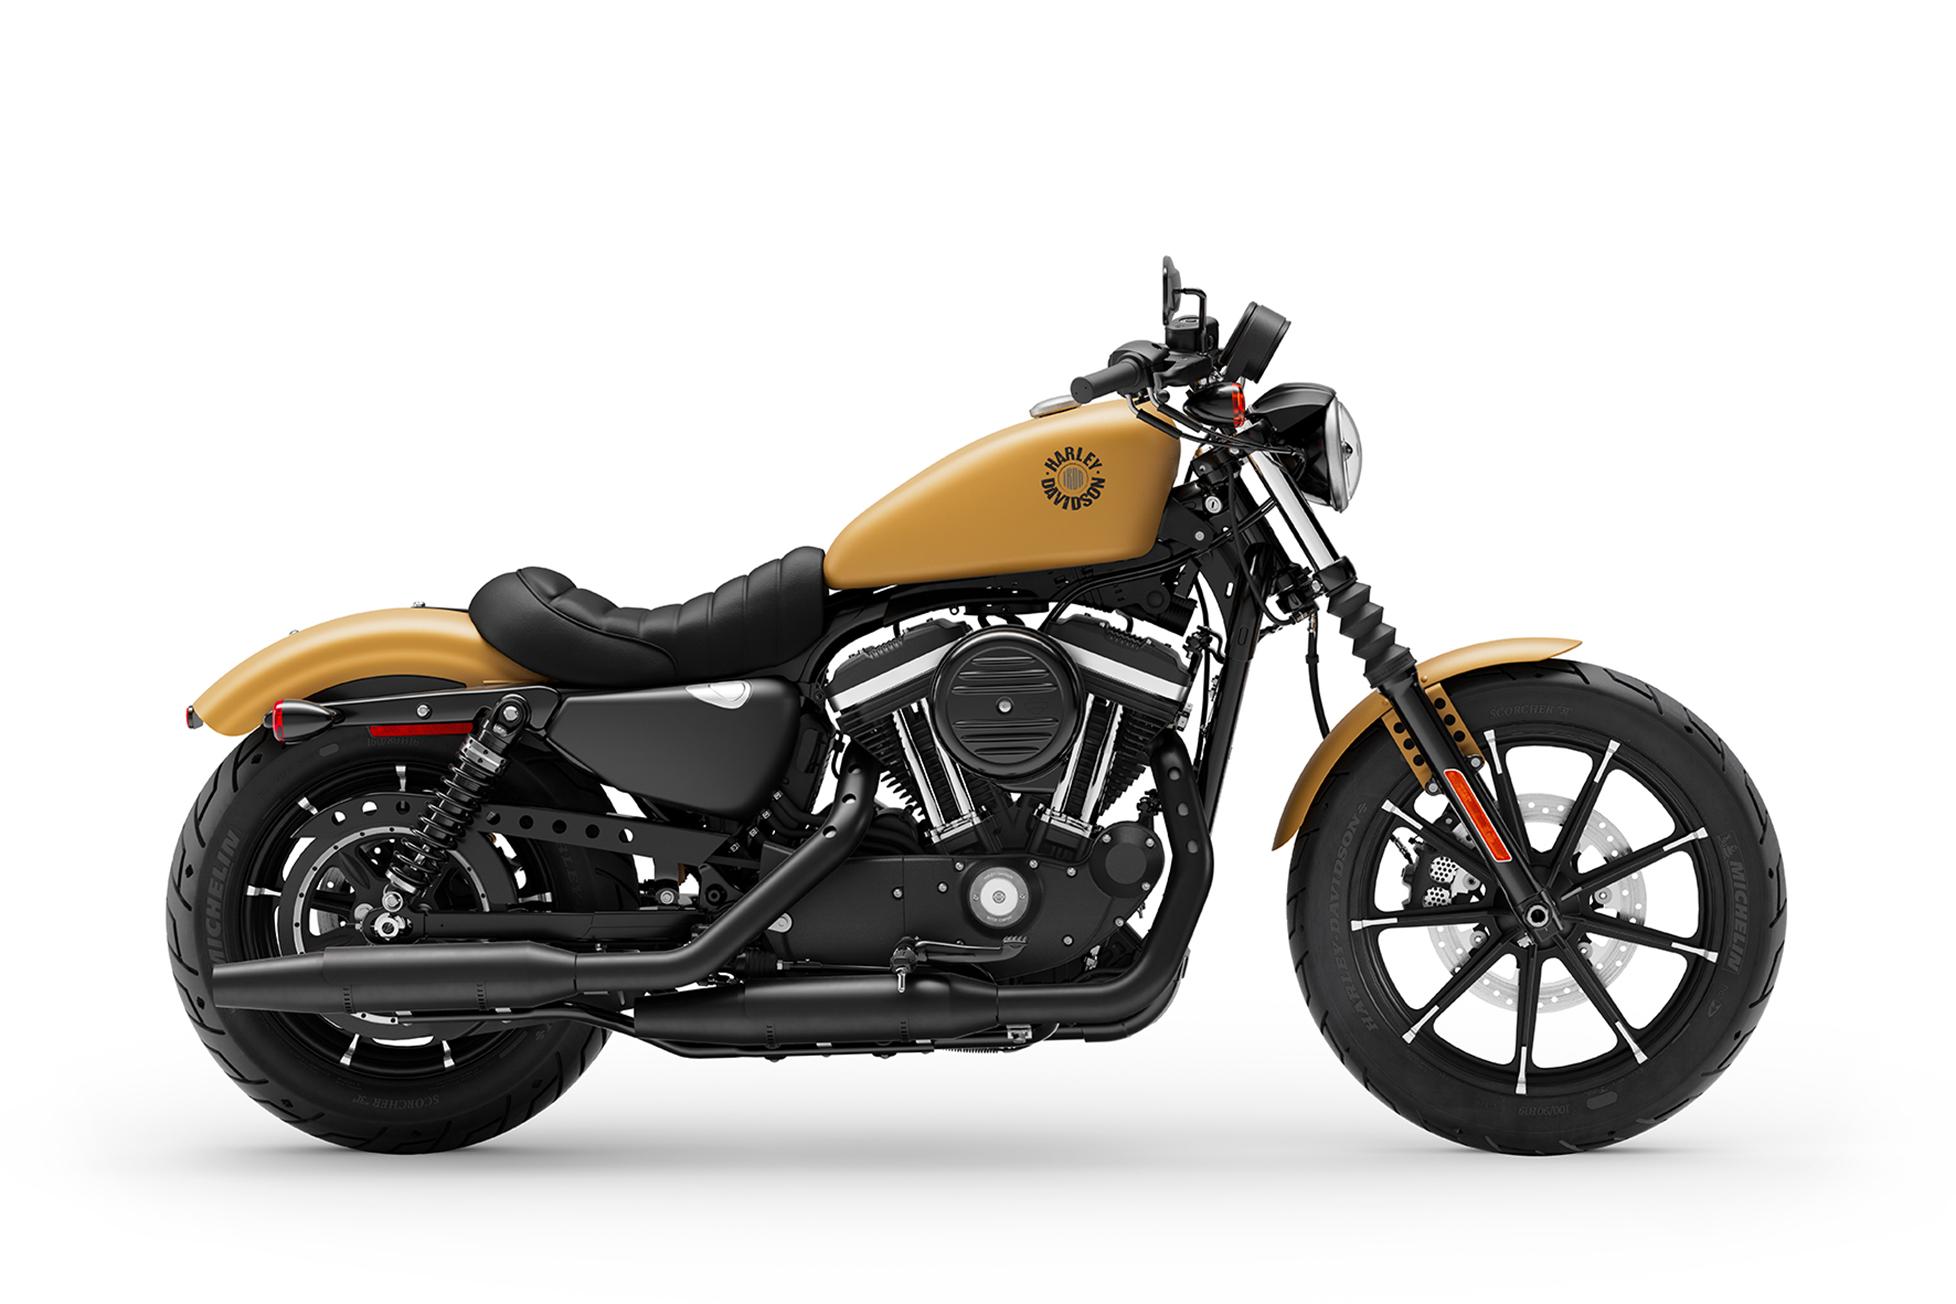 compare bikes motorcycle specs comparison harley davidson usa rh harley davidson com Harley 883R Harley 1200 Low